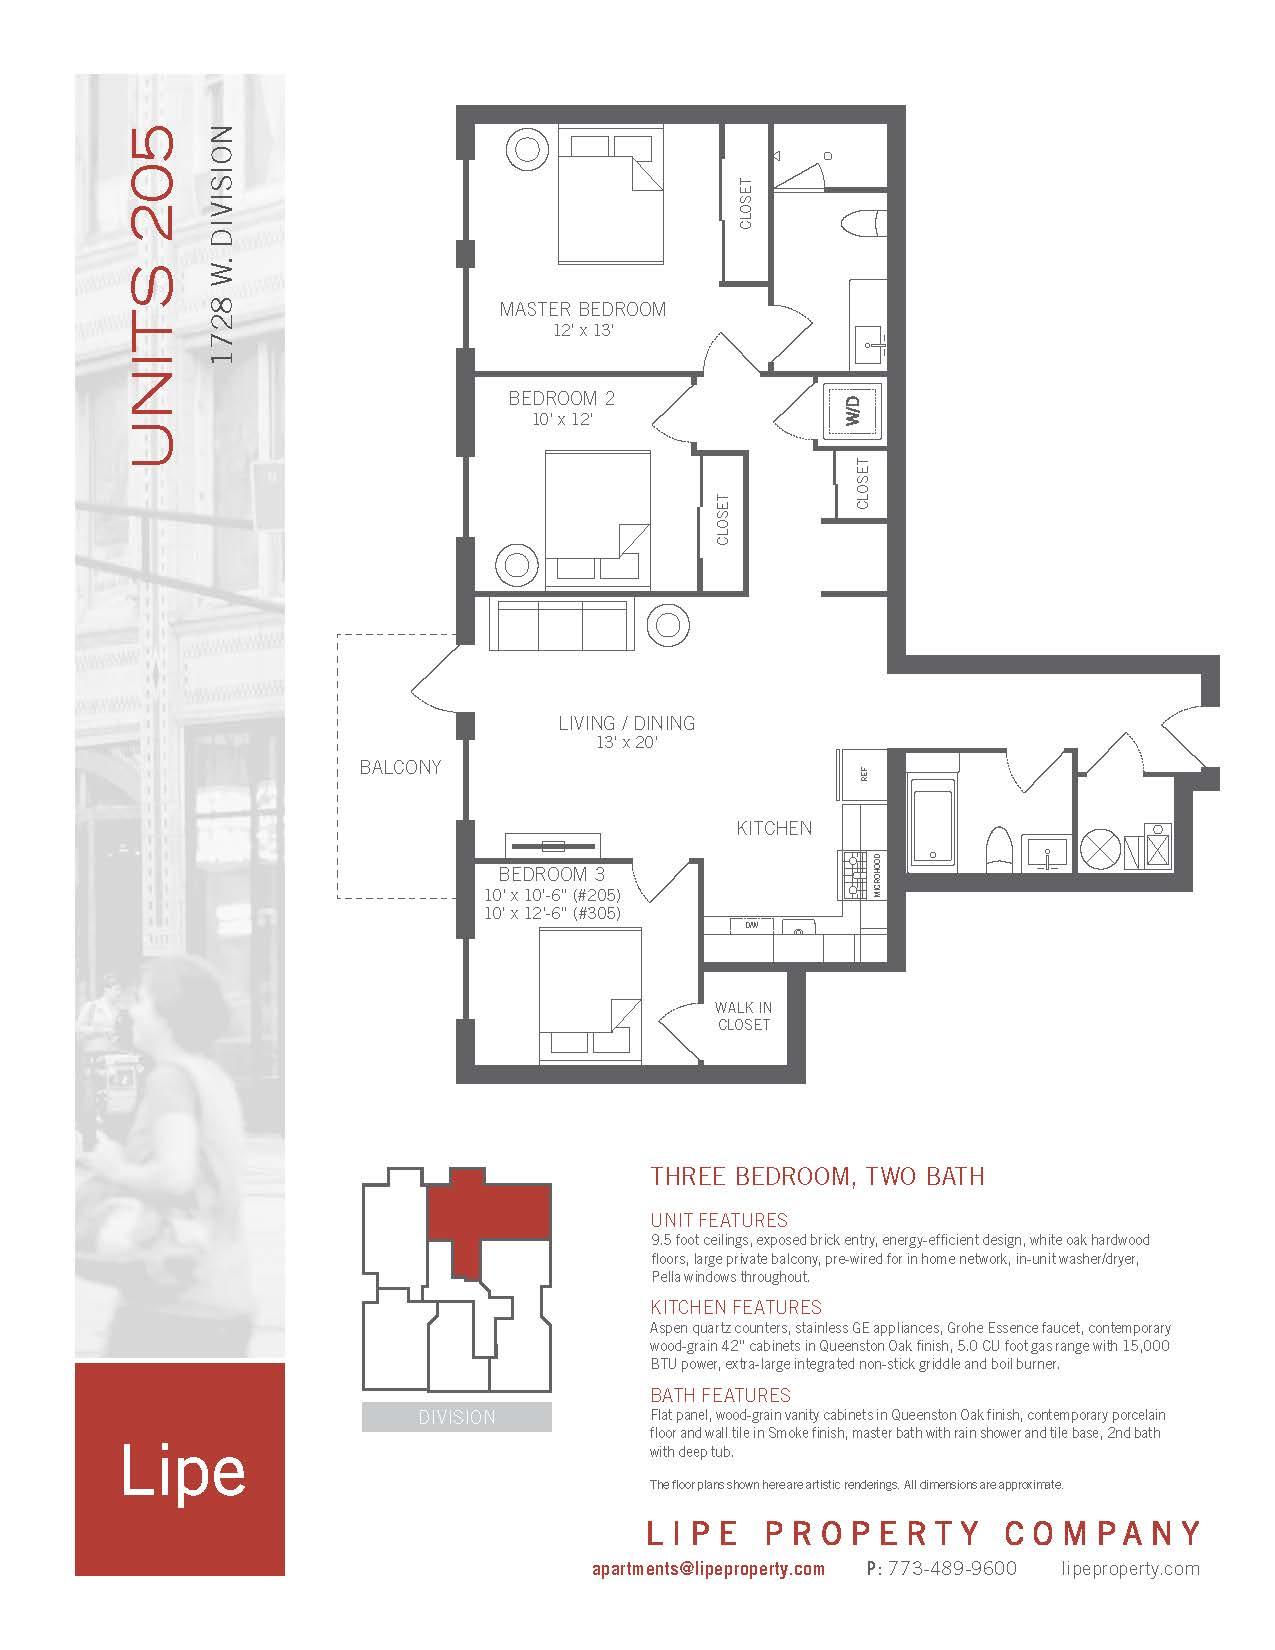 1728-West-Division-205-Floorplan-Chicago-apartment-for-rent.jpg